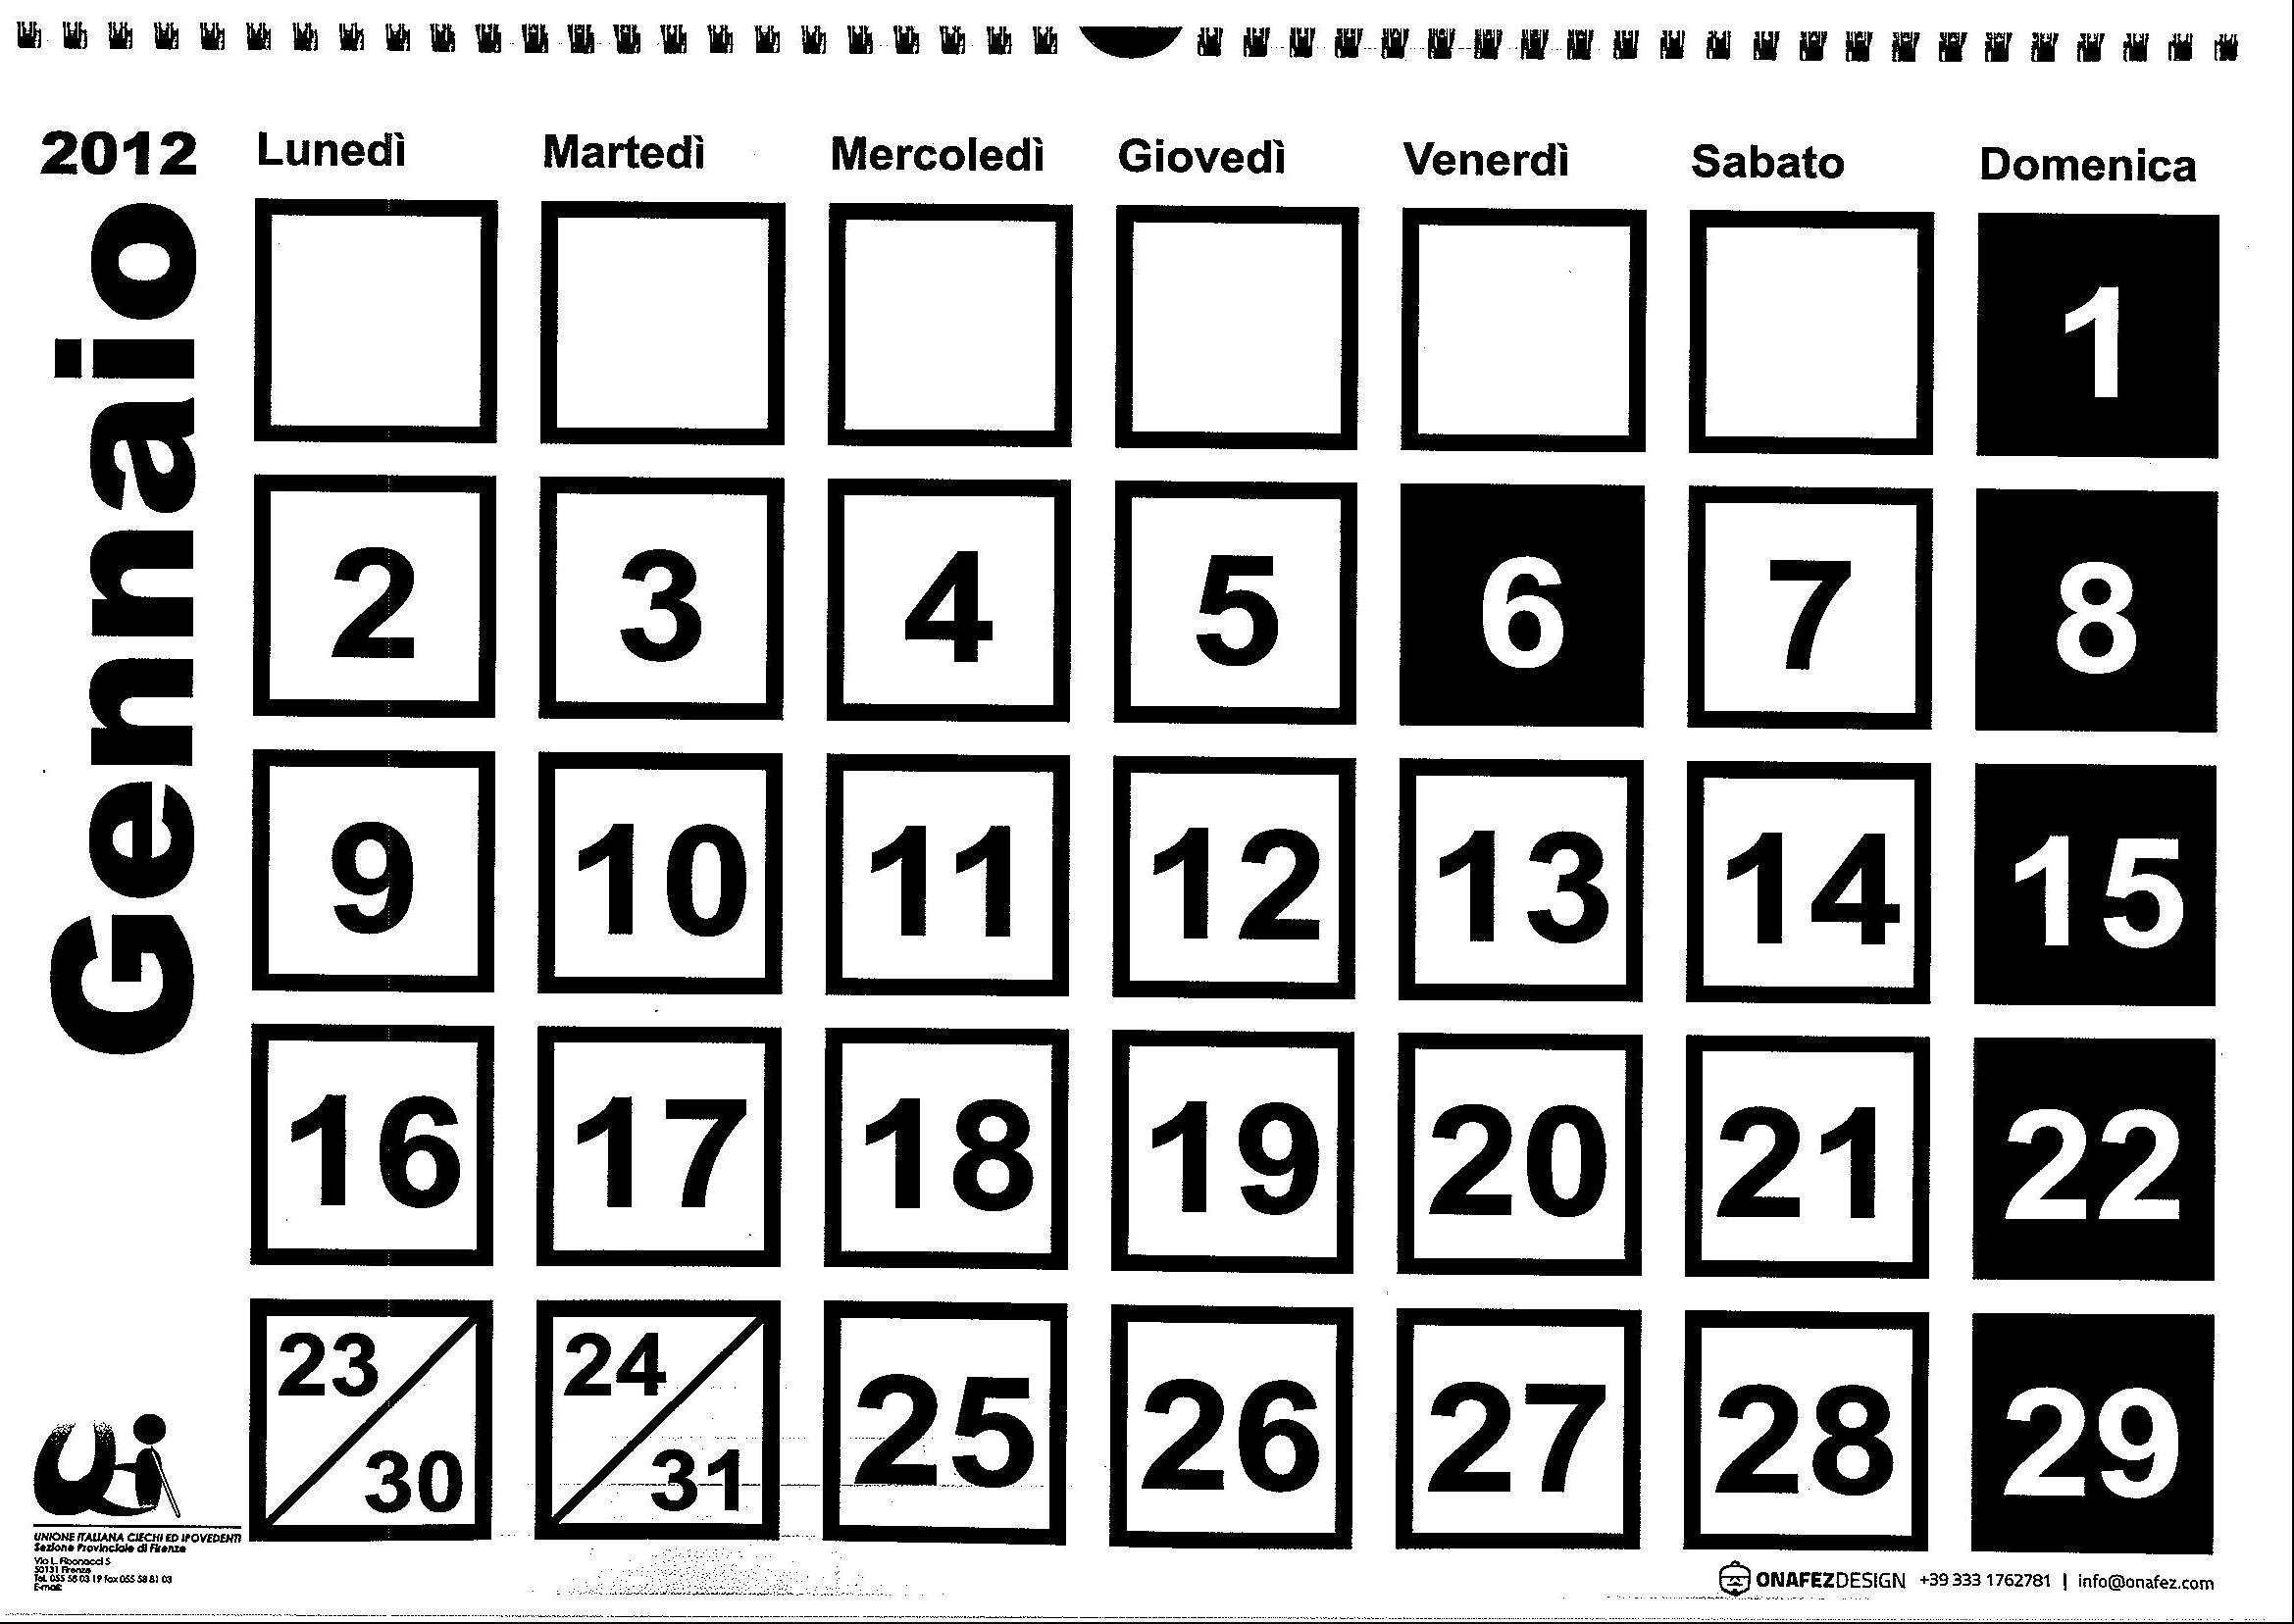 Calendario 2012 a caratteri ingranditi per ipovedenti